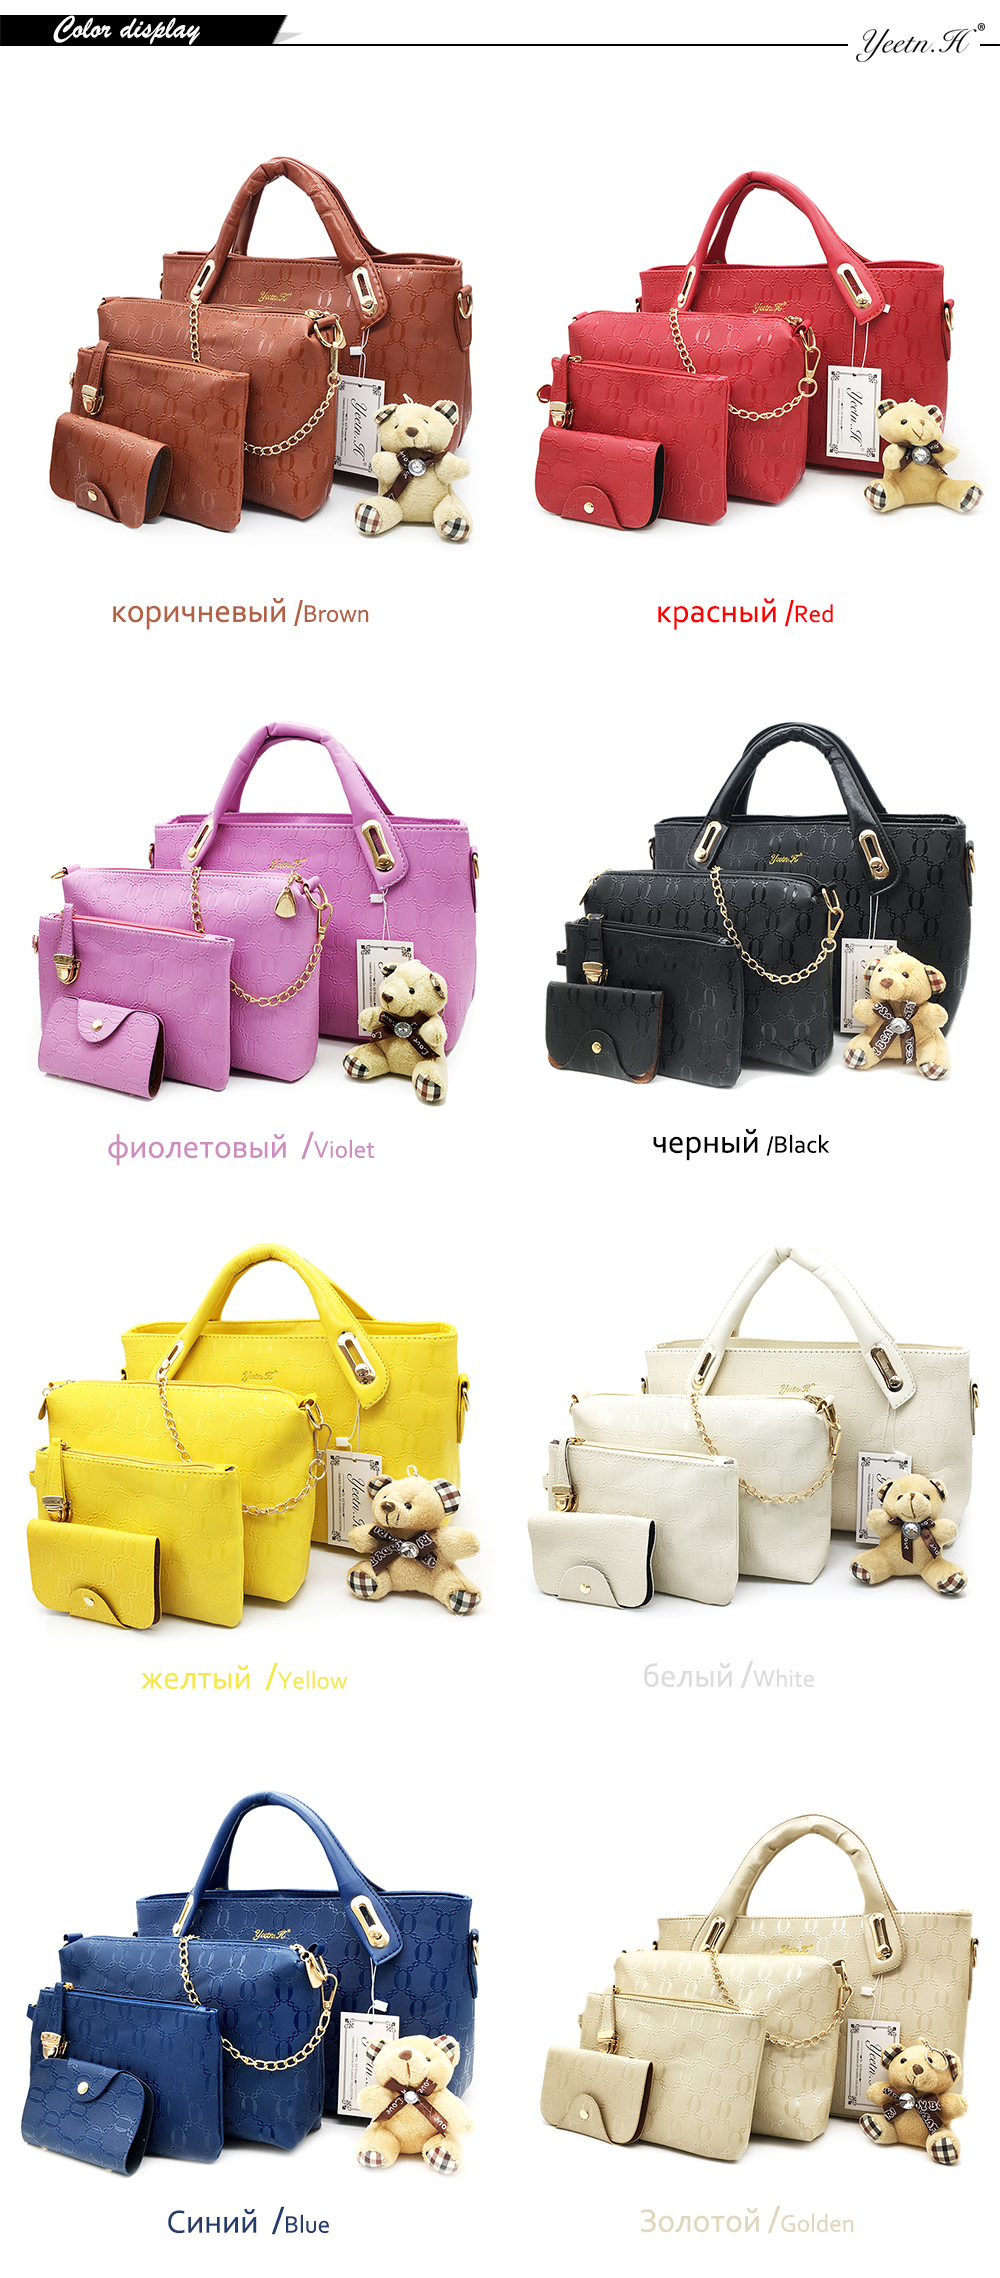 Yeetn.H Women 4 Set Handbags Pu Leather Fashion Designer Handbag Shoulder Bag Black Vintage Female Messenger Bag Sac A Main M129 1